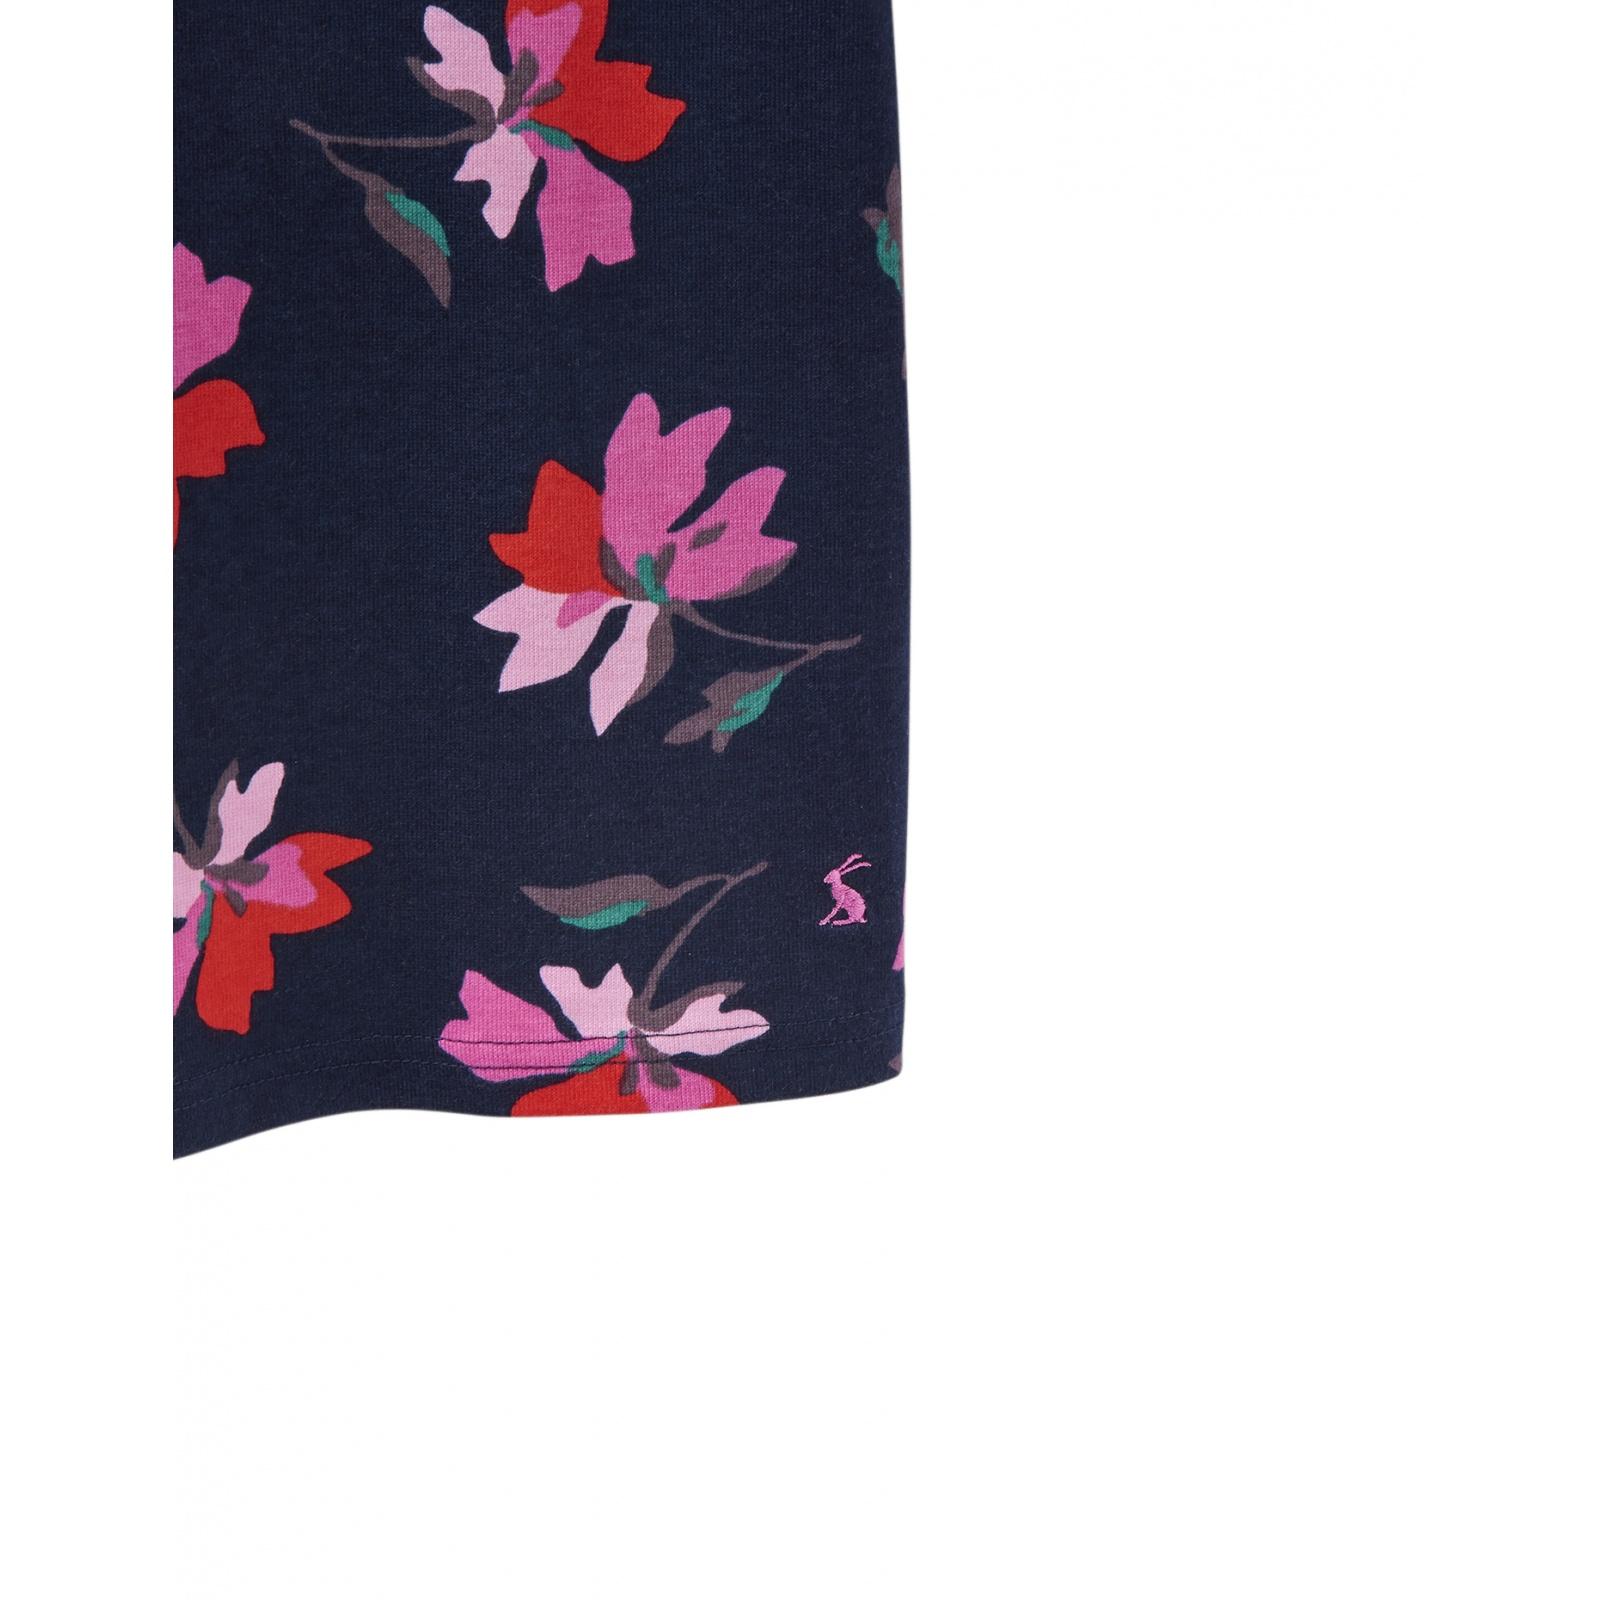 Joules-Riviera-Print-T-Shirt-Dress-with-Short-Sleeves-SS19 thumbnail 24